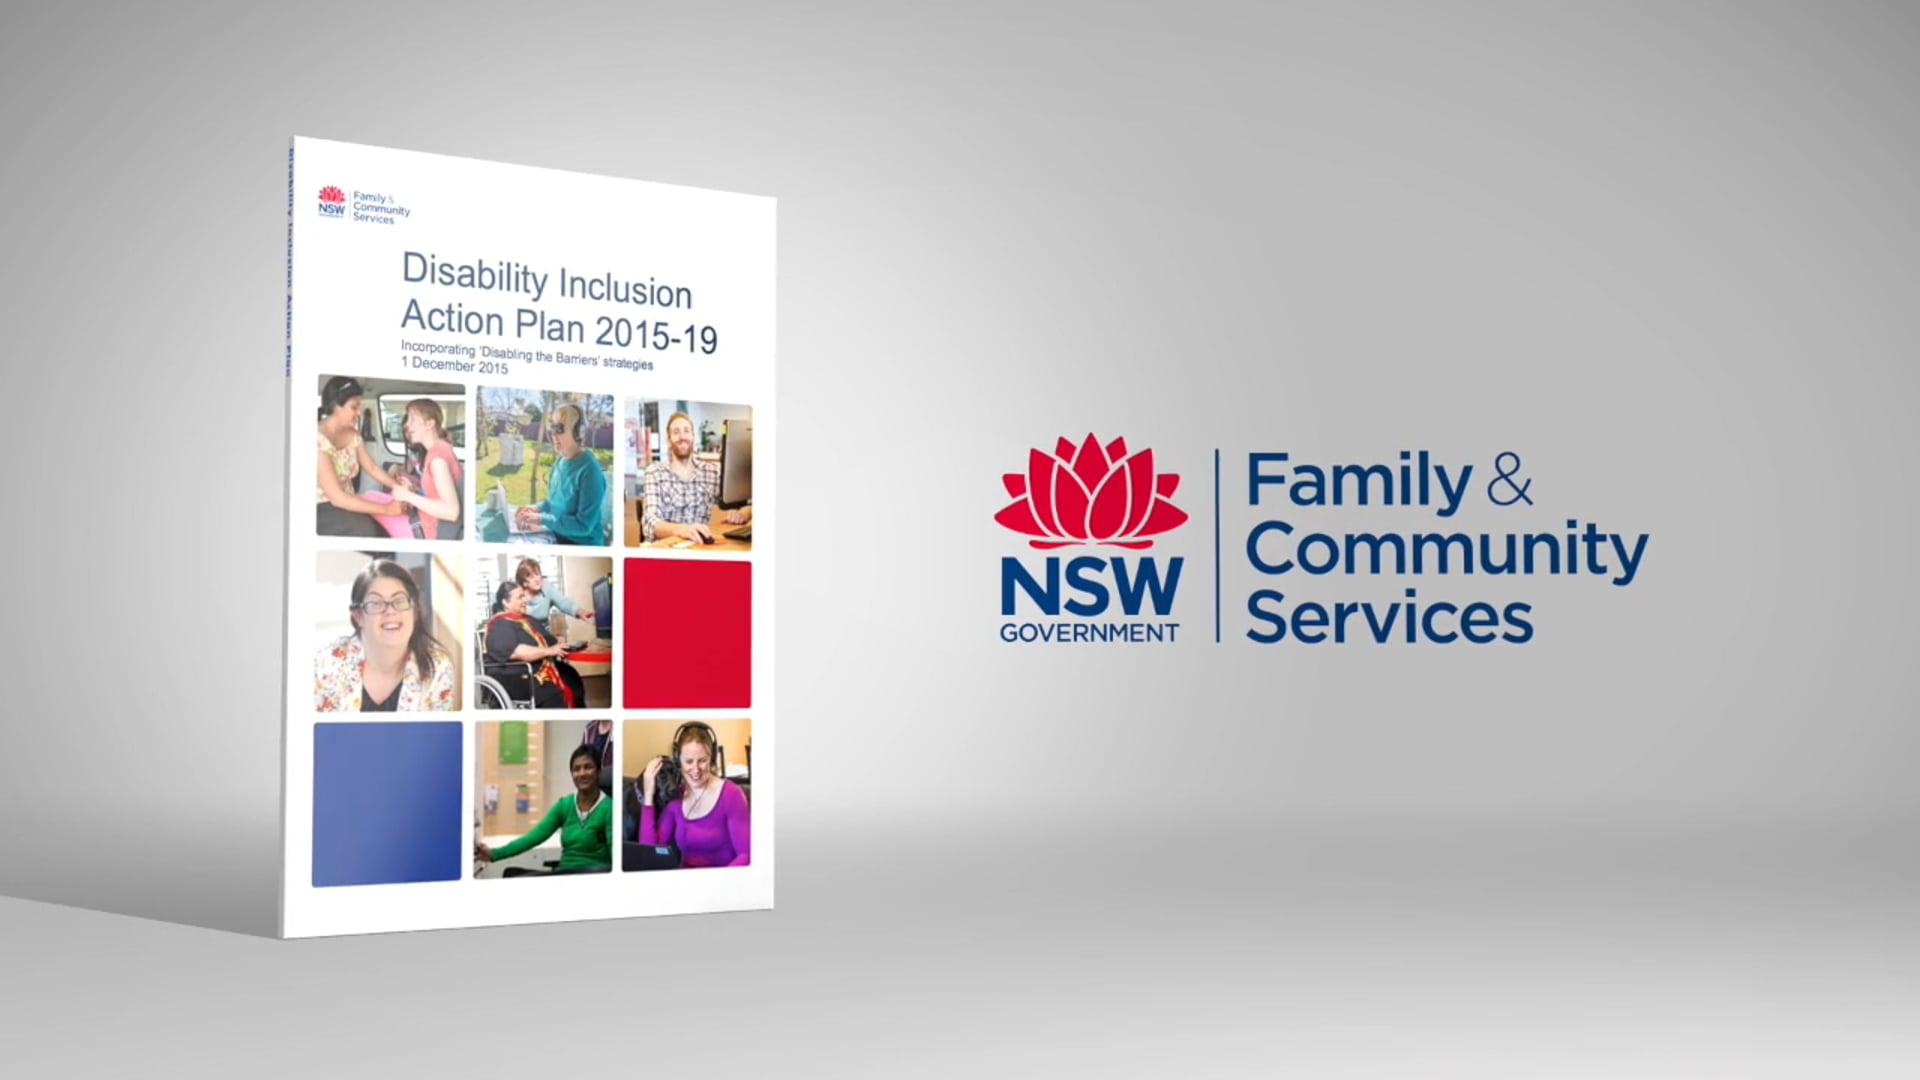 FACS Disability Inclusion Action Plan